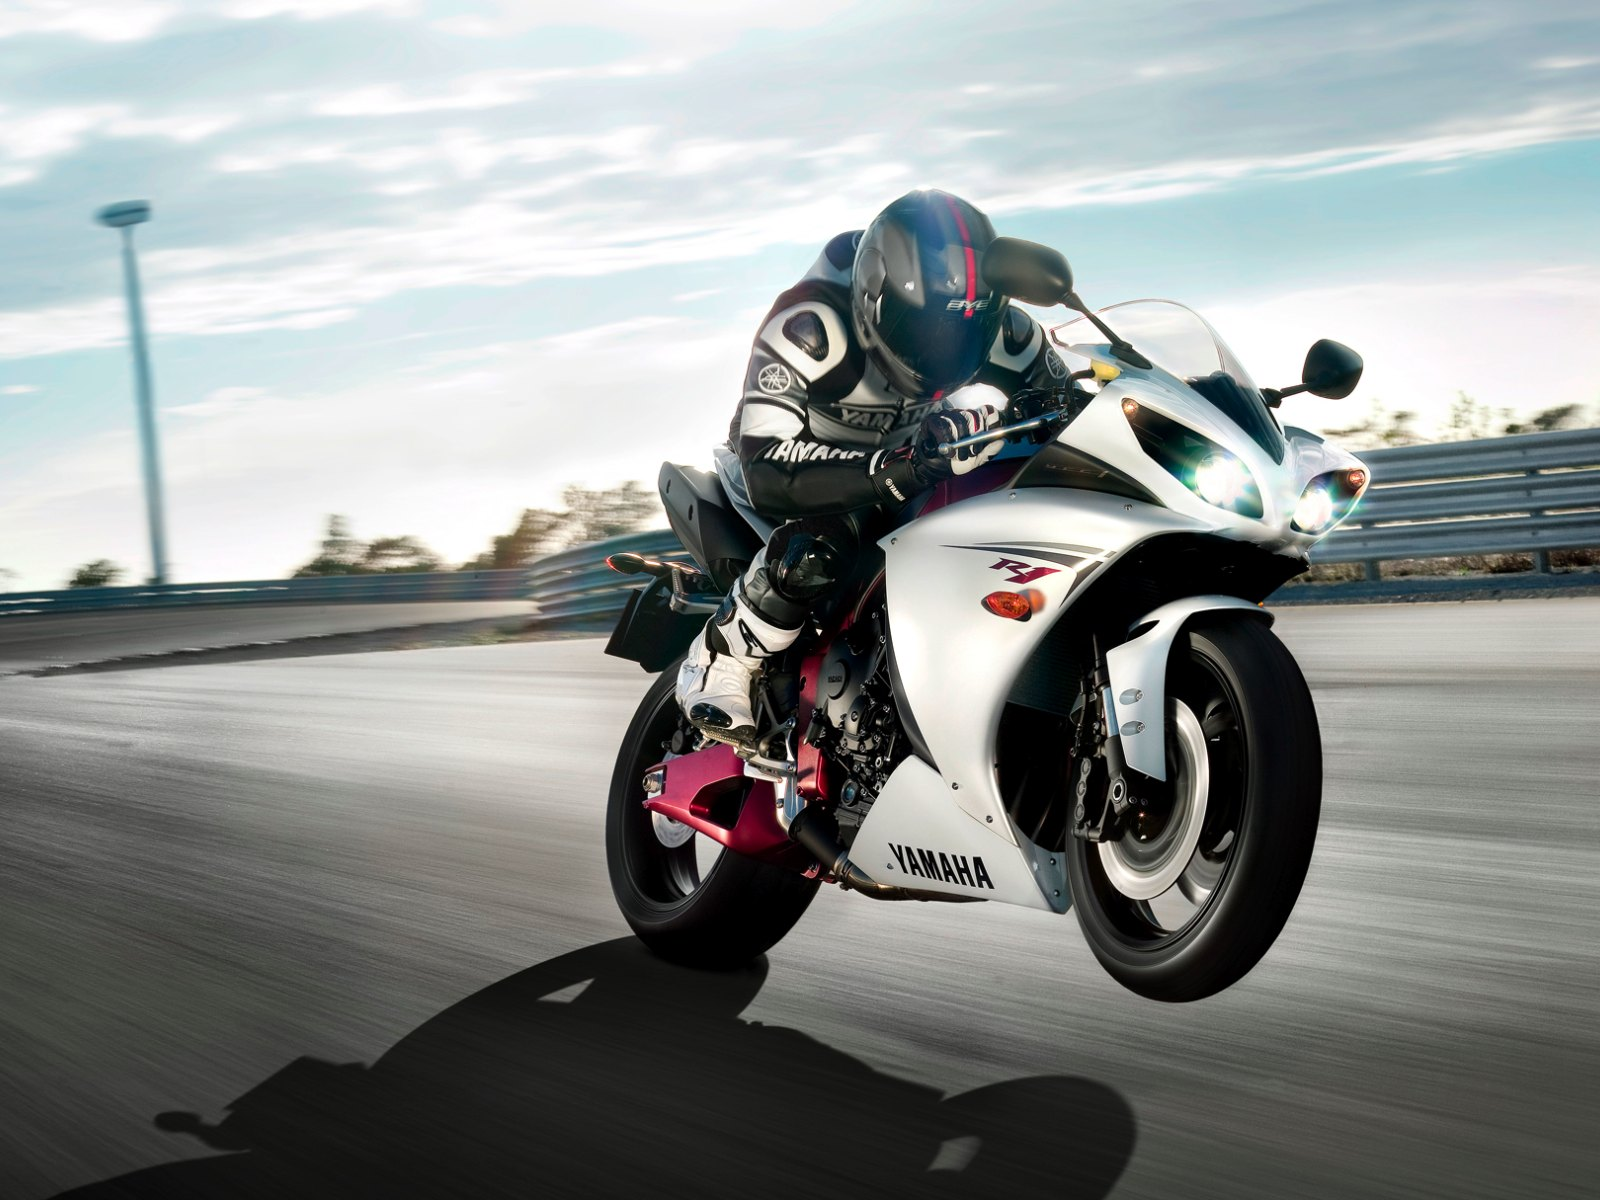 Yamaha YZF R1 Wallpapers 1600x1200 1600x1200